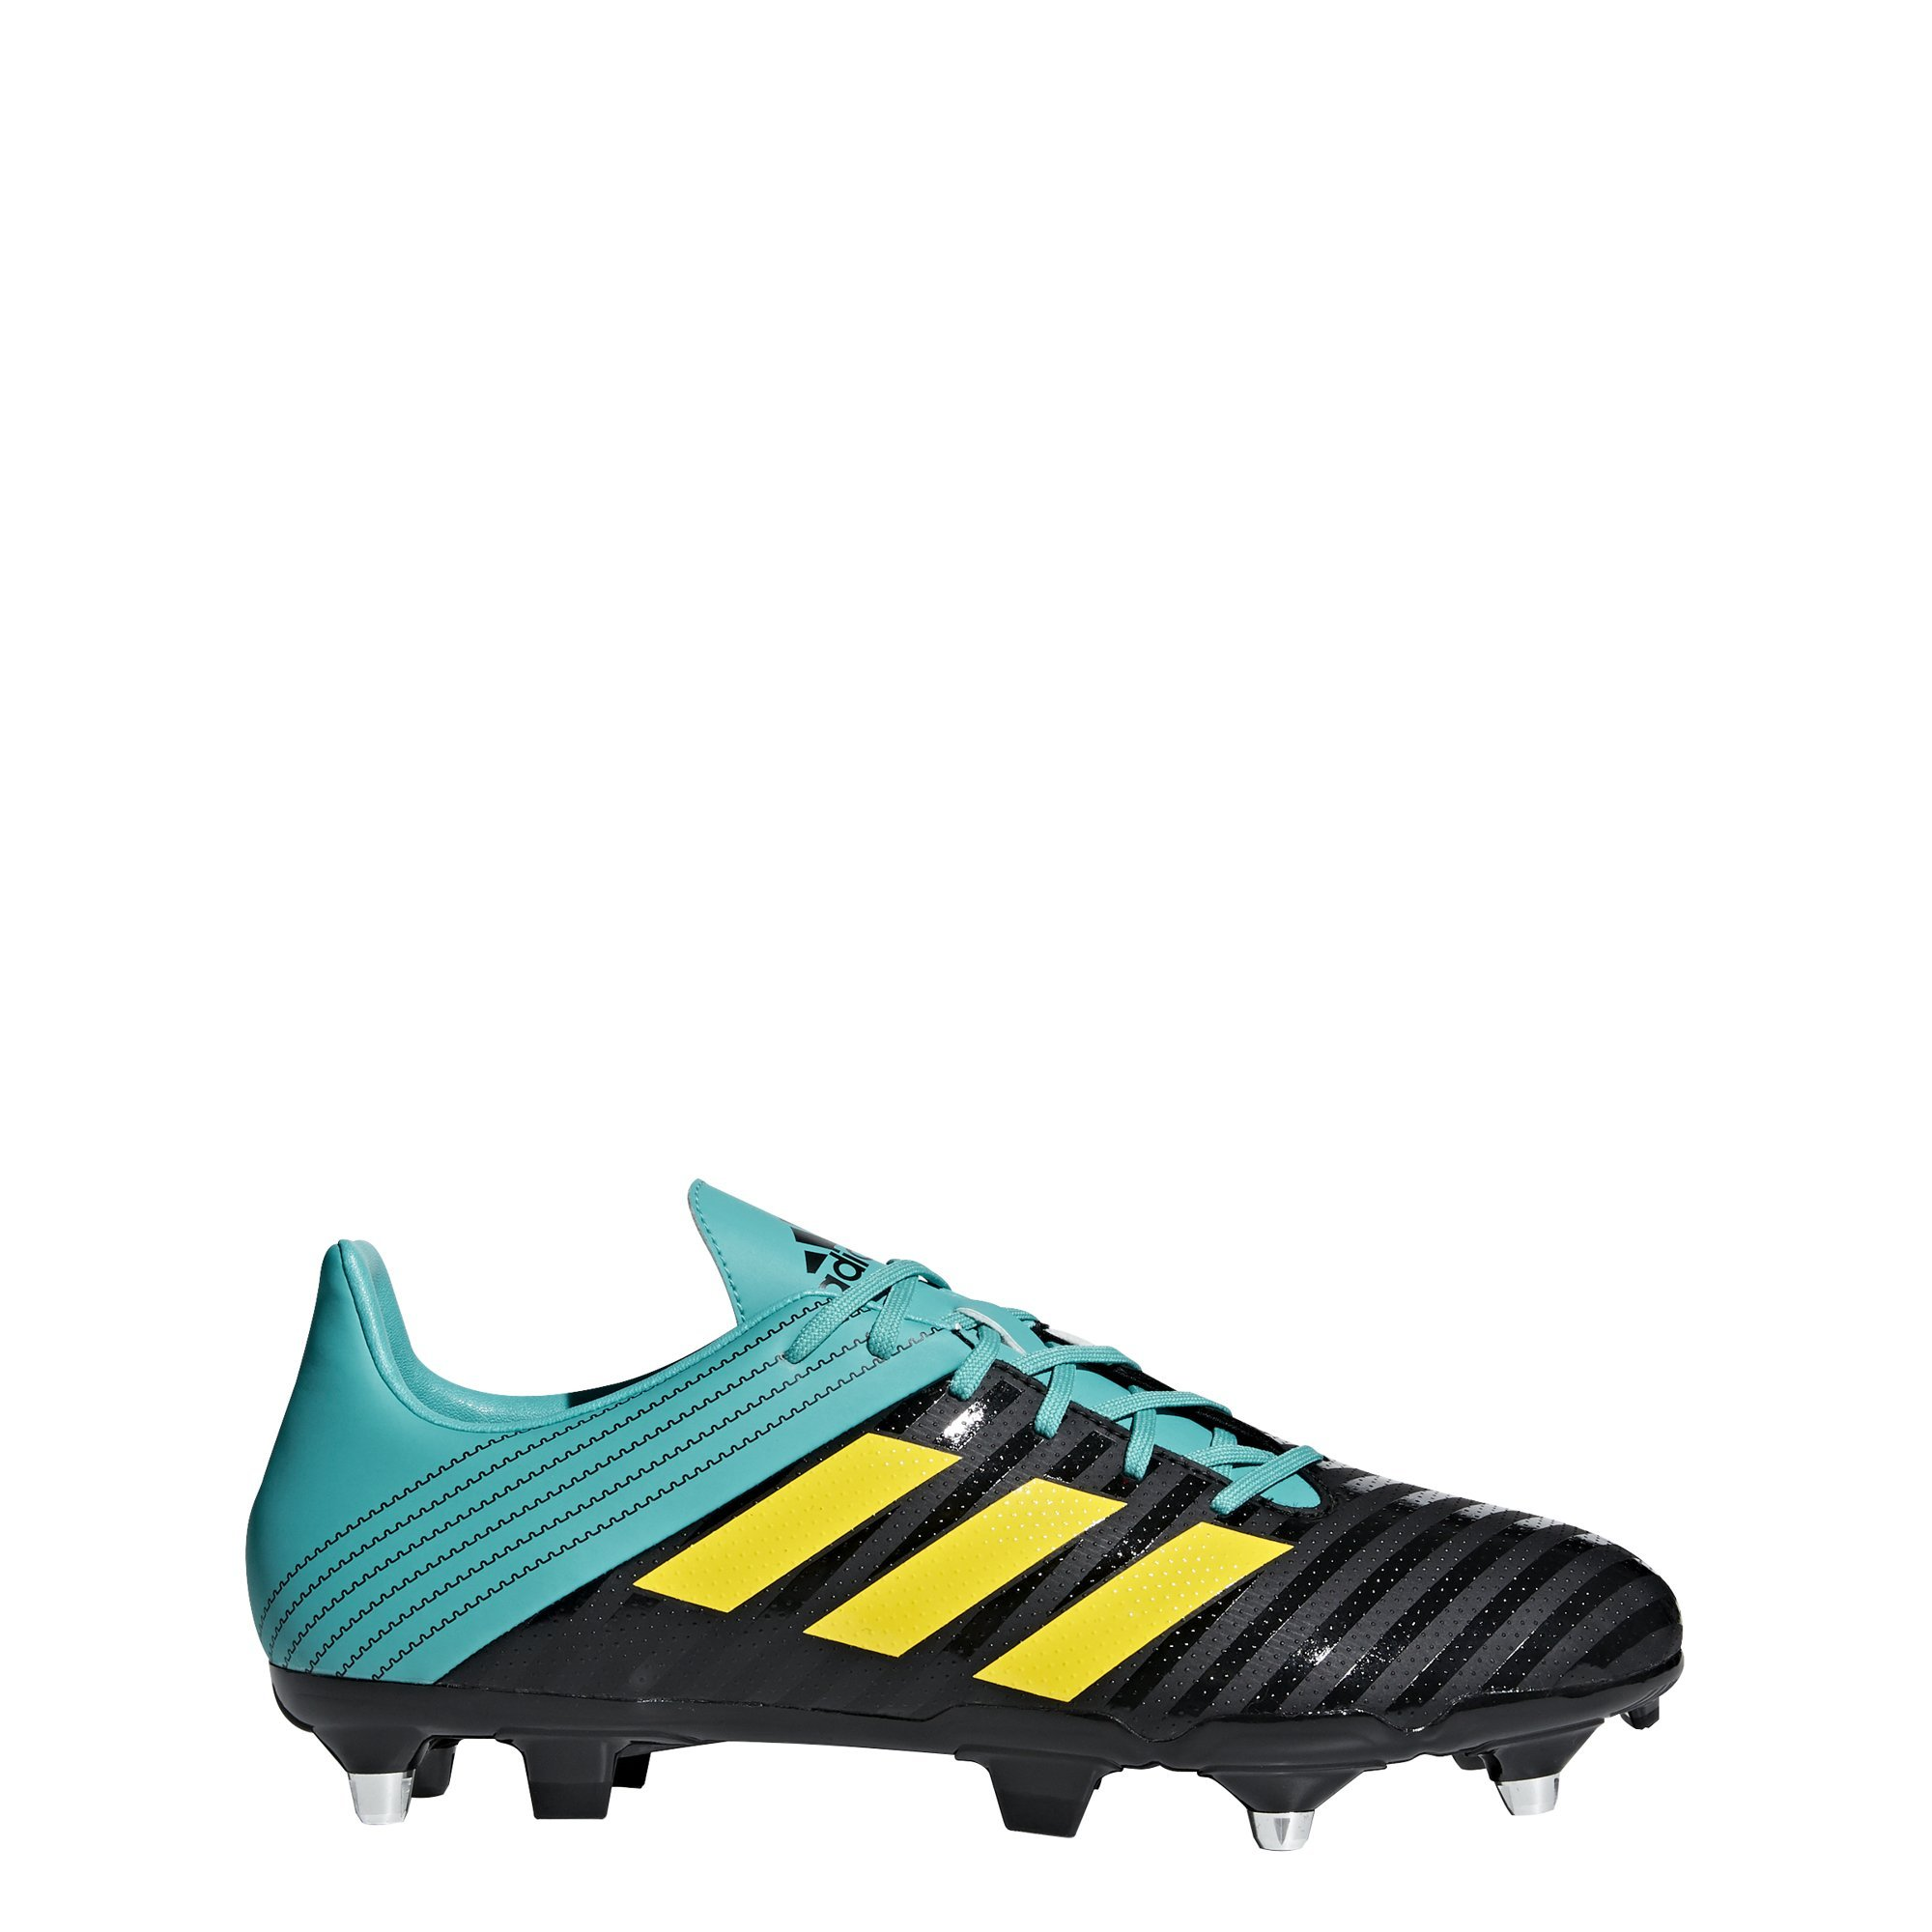 Adidas Malice SG Boots Adults